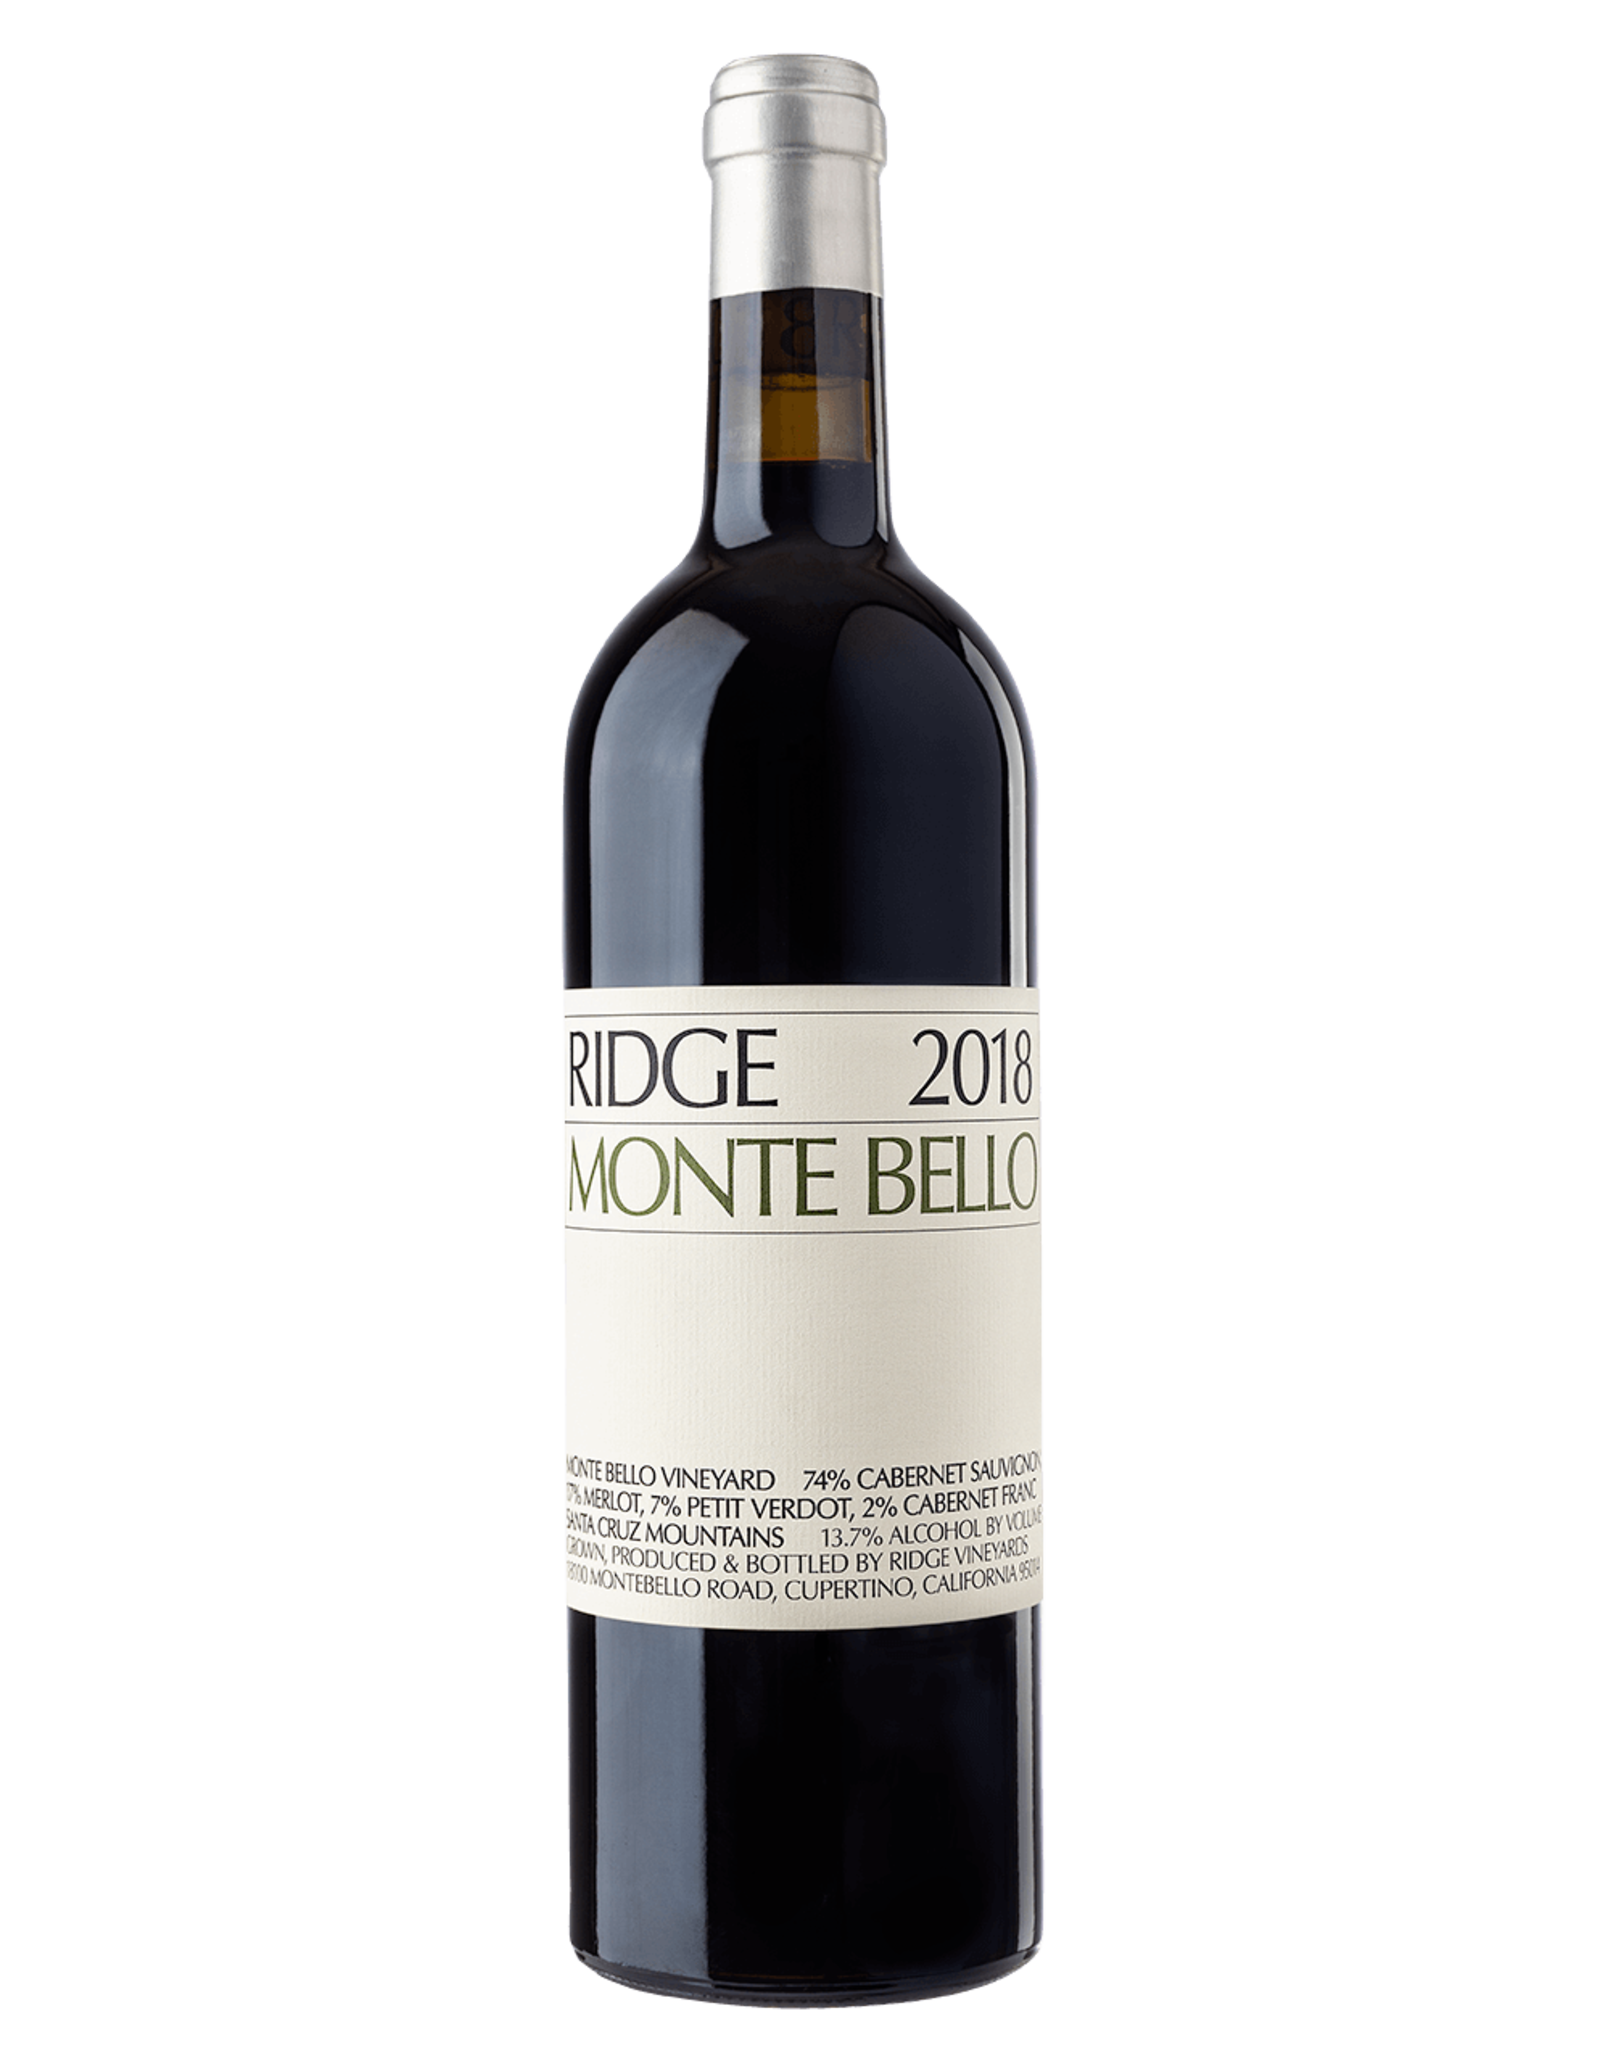 Ridge Monte Bello 2018